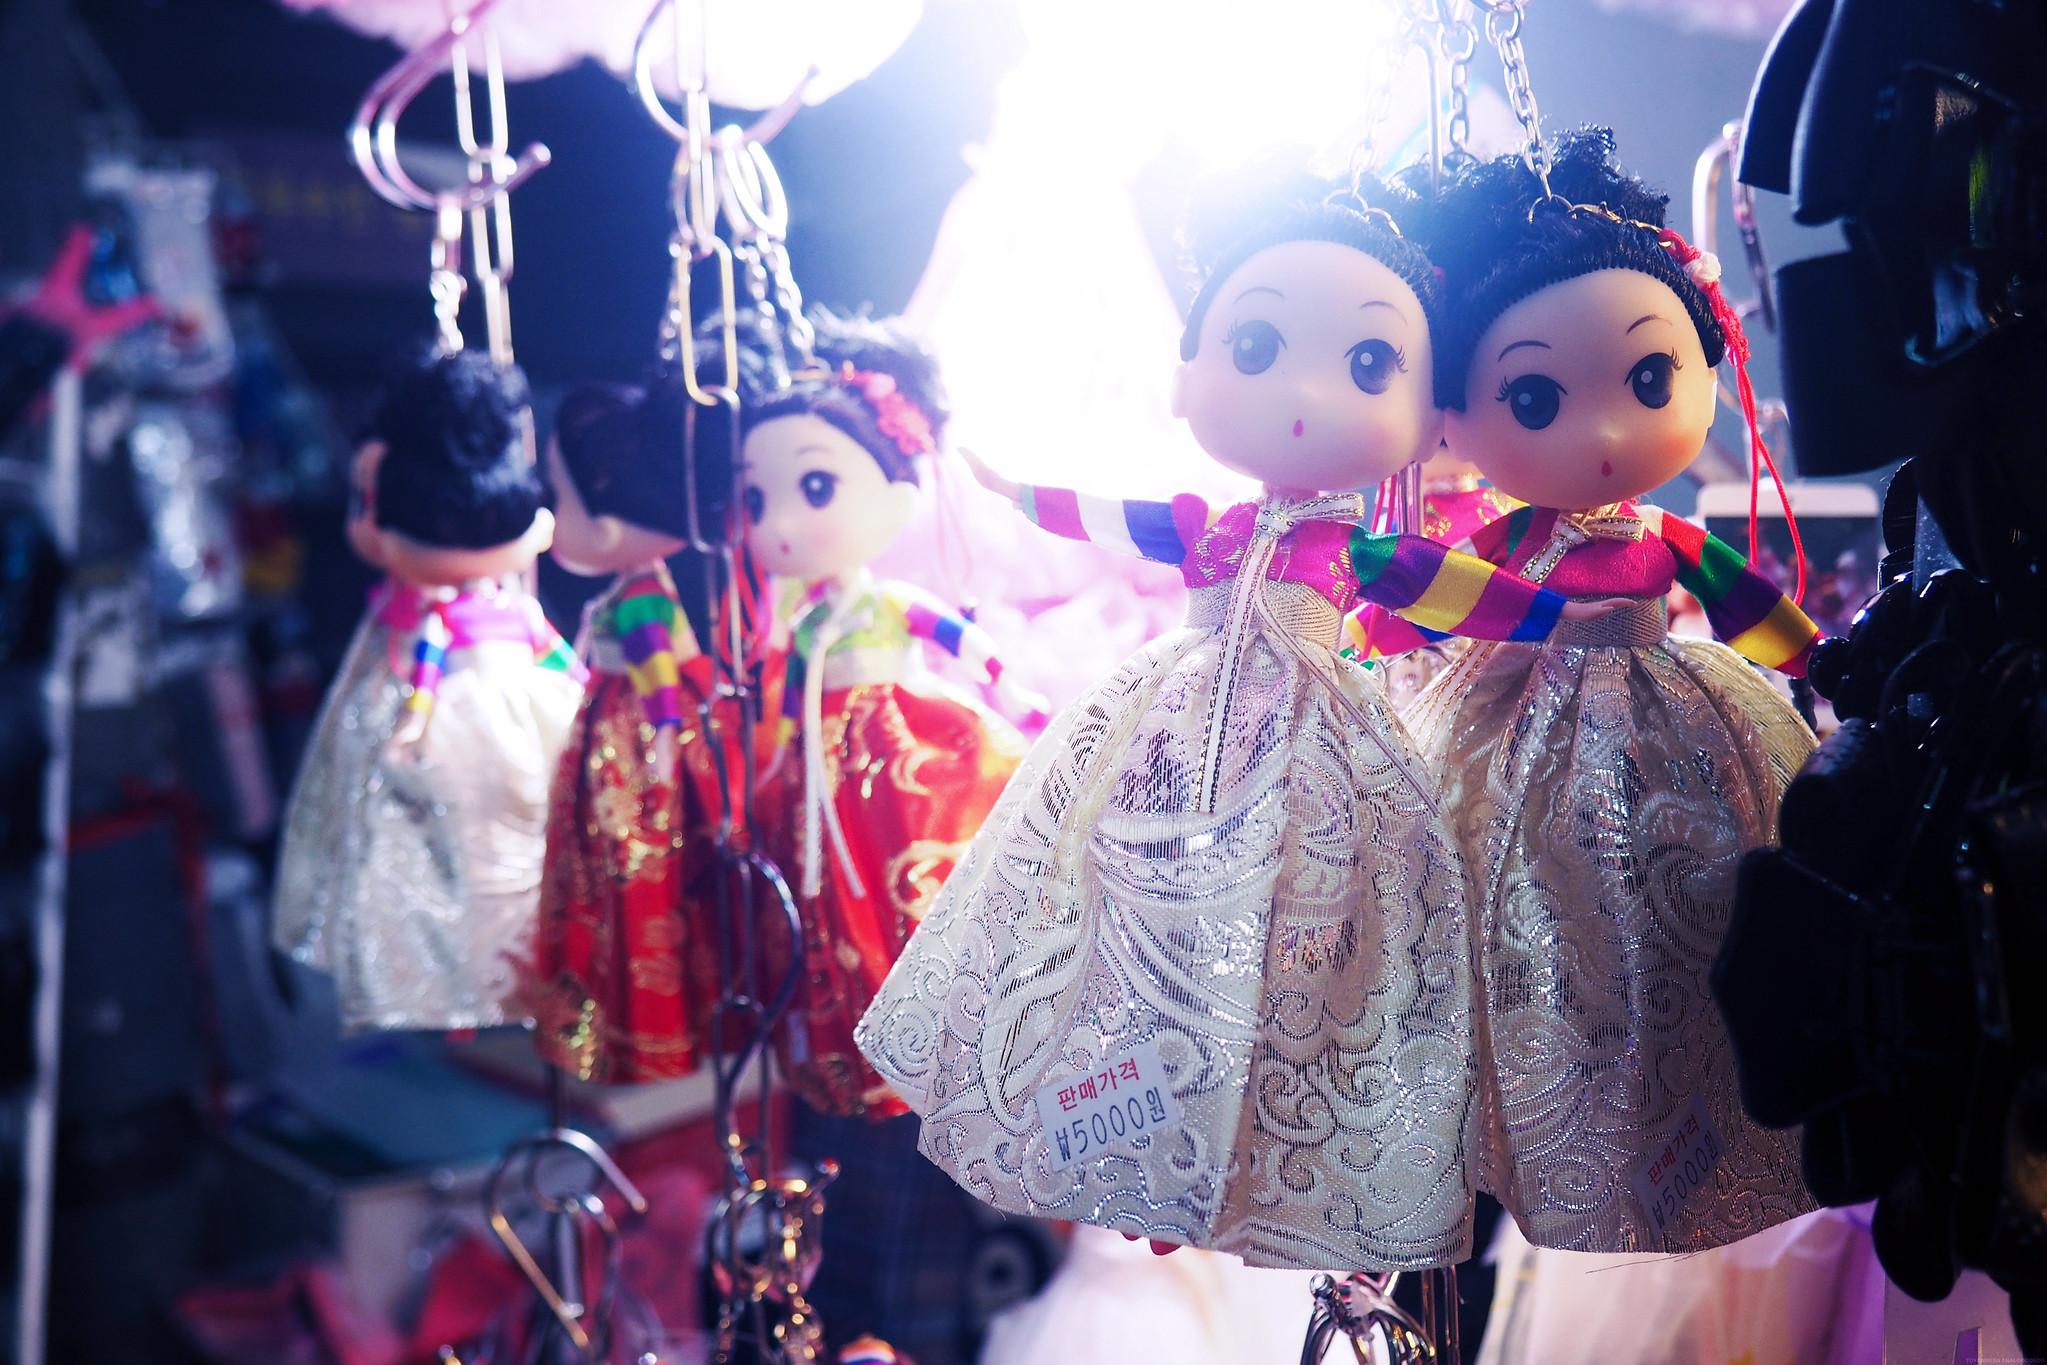 Kawaii Dolls Pretty Gown Seoul South Korea Aesthetic_effected